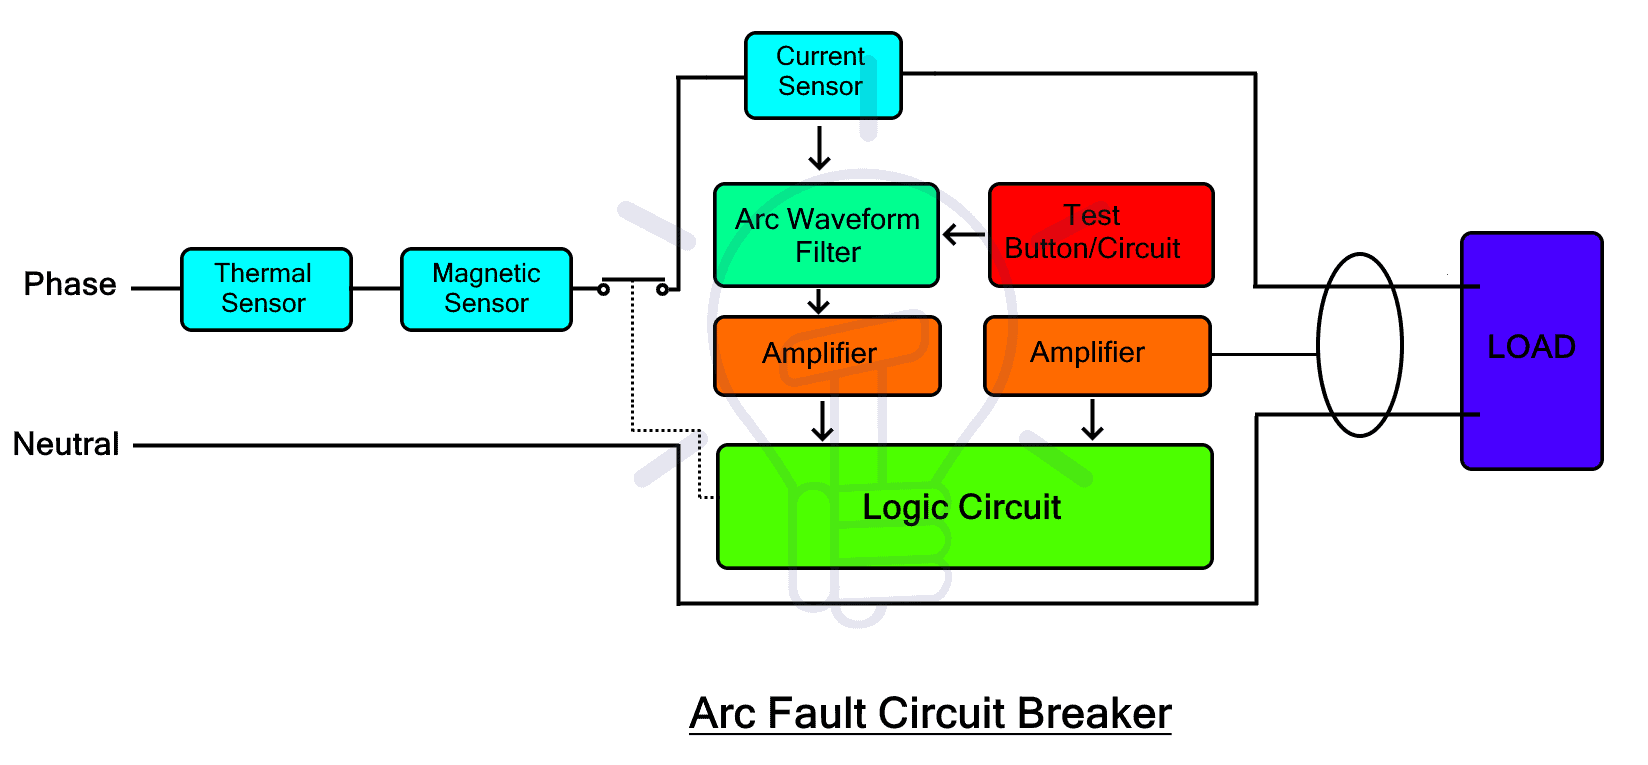 AFCI or Arc Fault Circuit Breaker